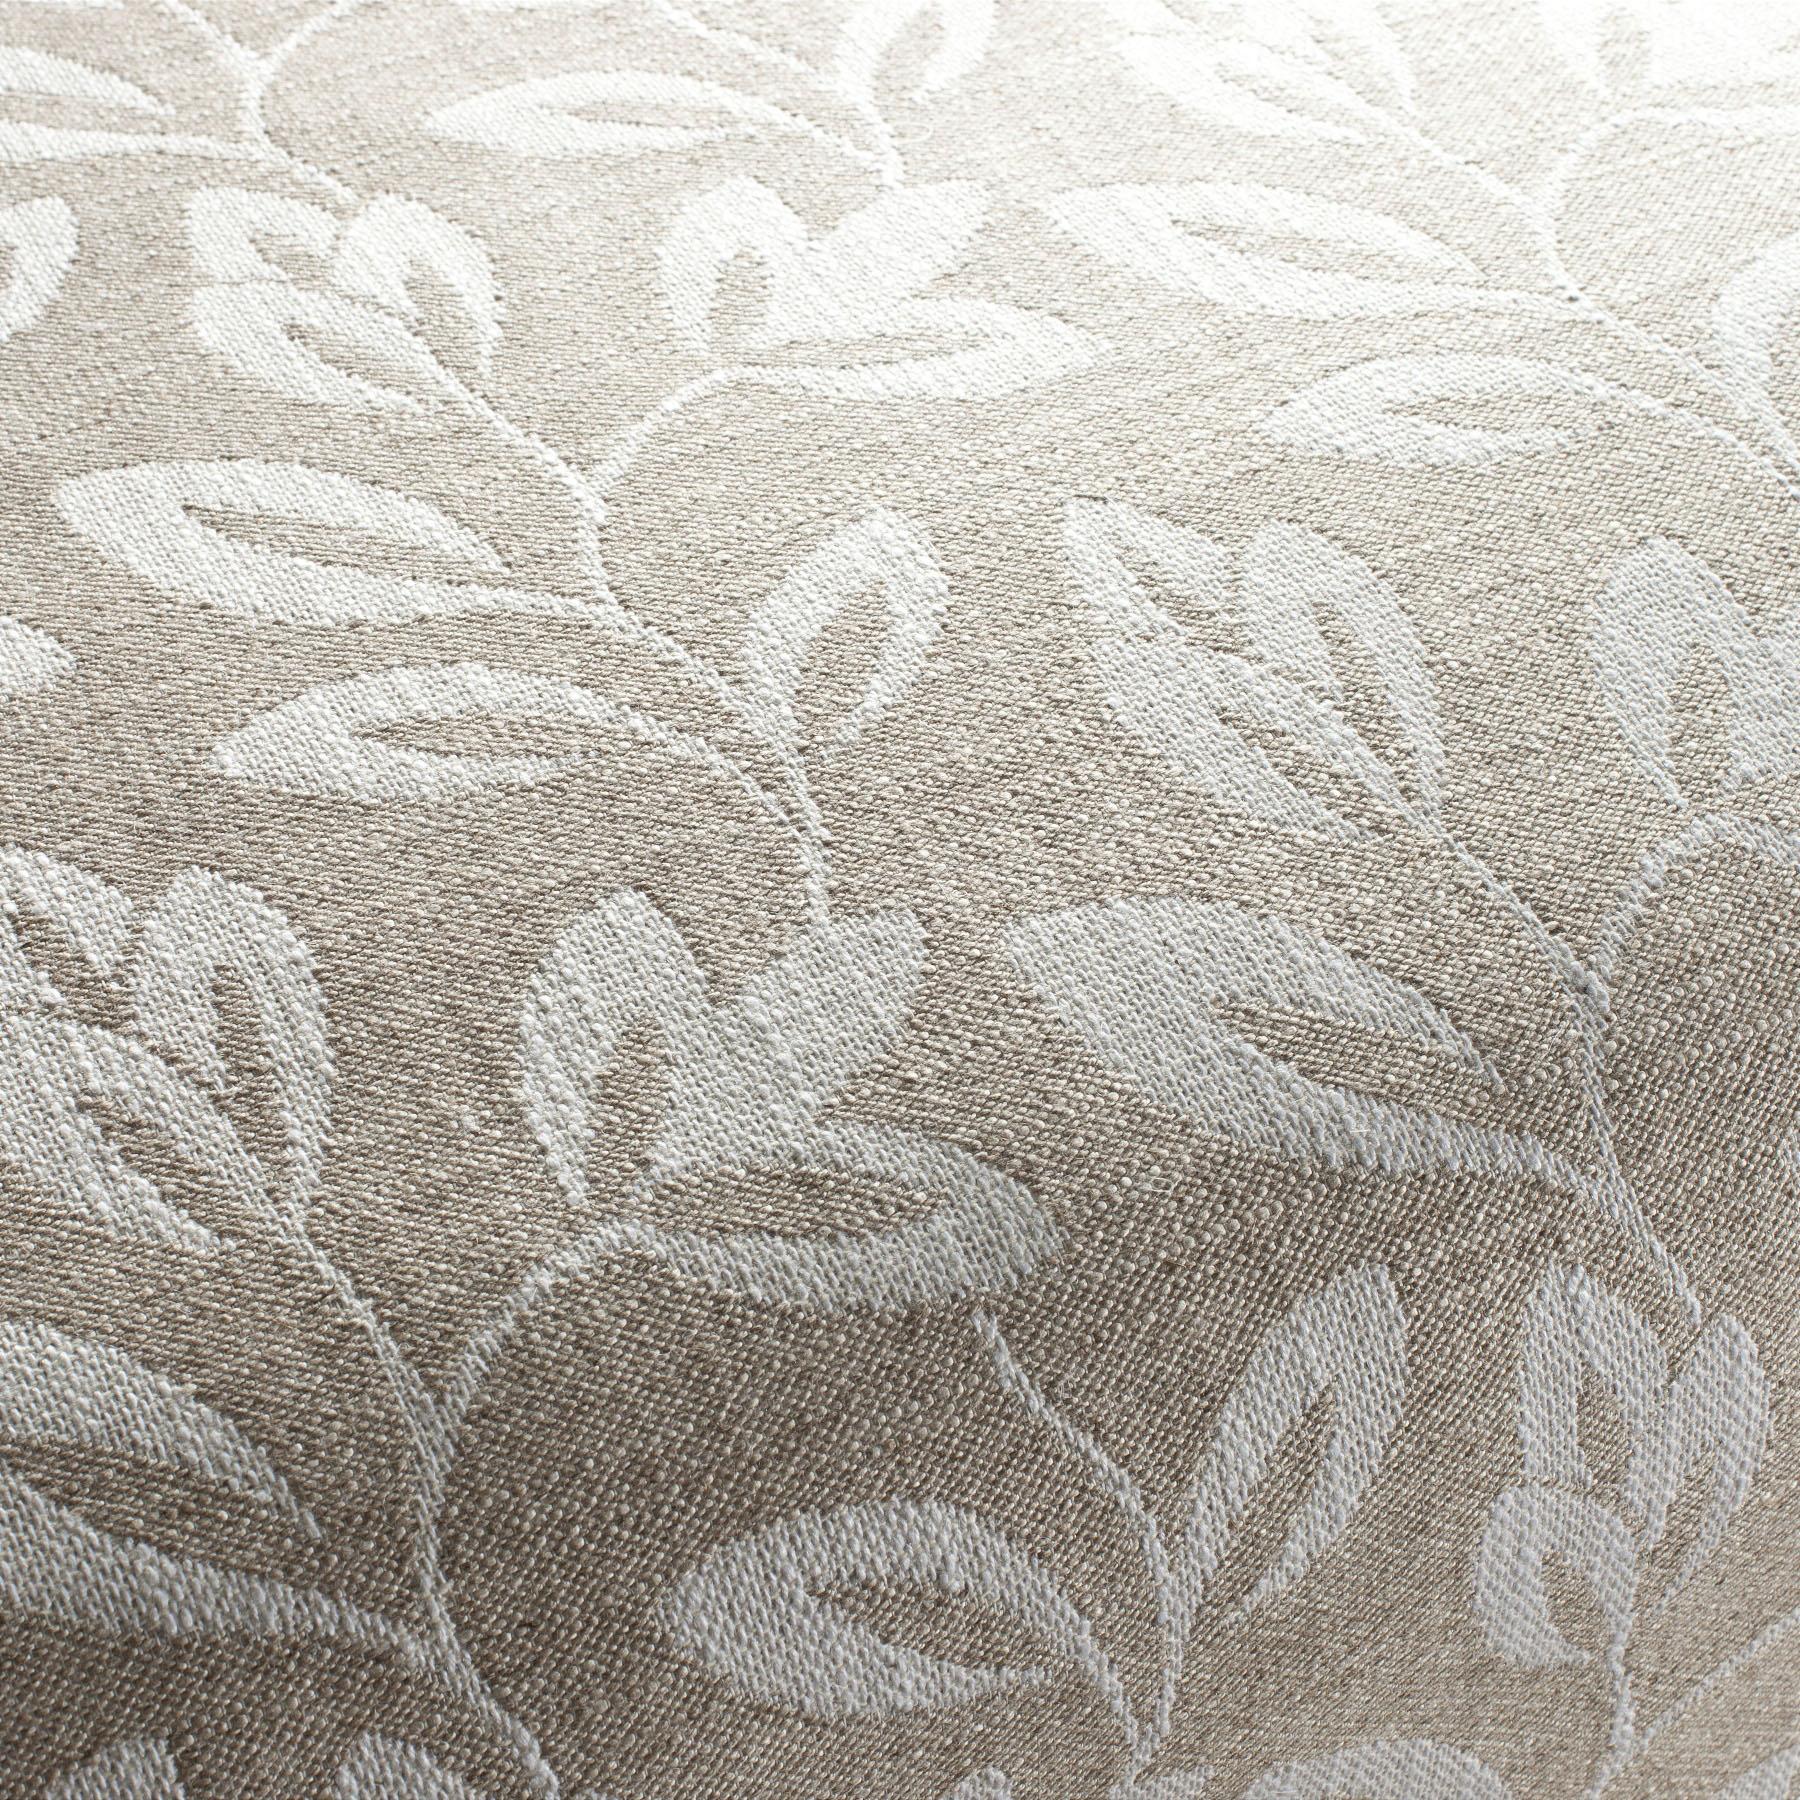 upholstery fabric campa 1 2952 070 jab anstoetz. Black Bedroom Furniture Sets. Home Design Ideas